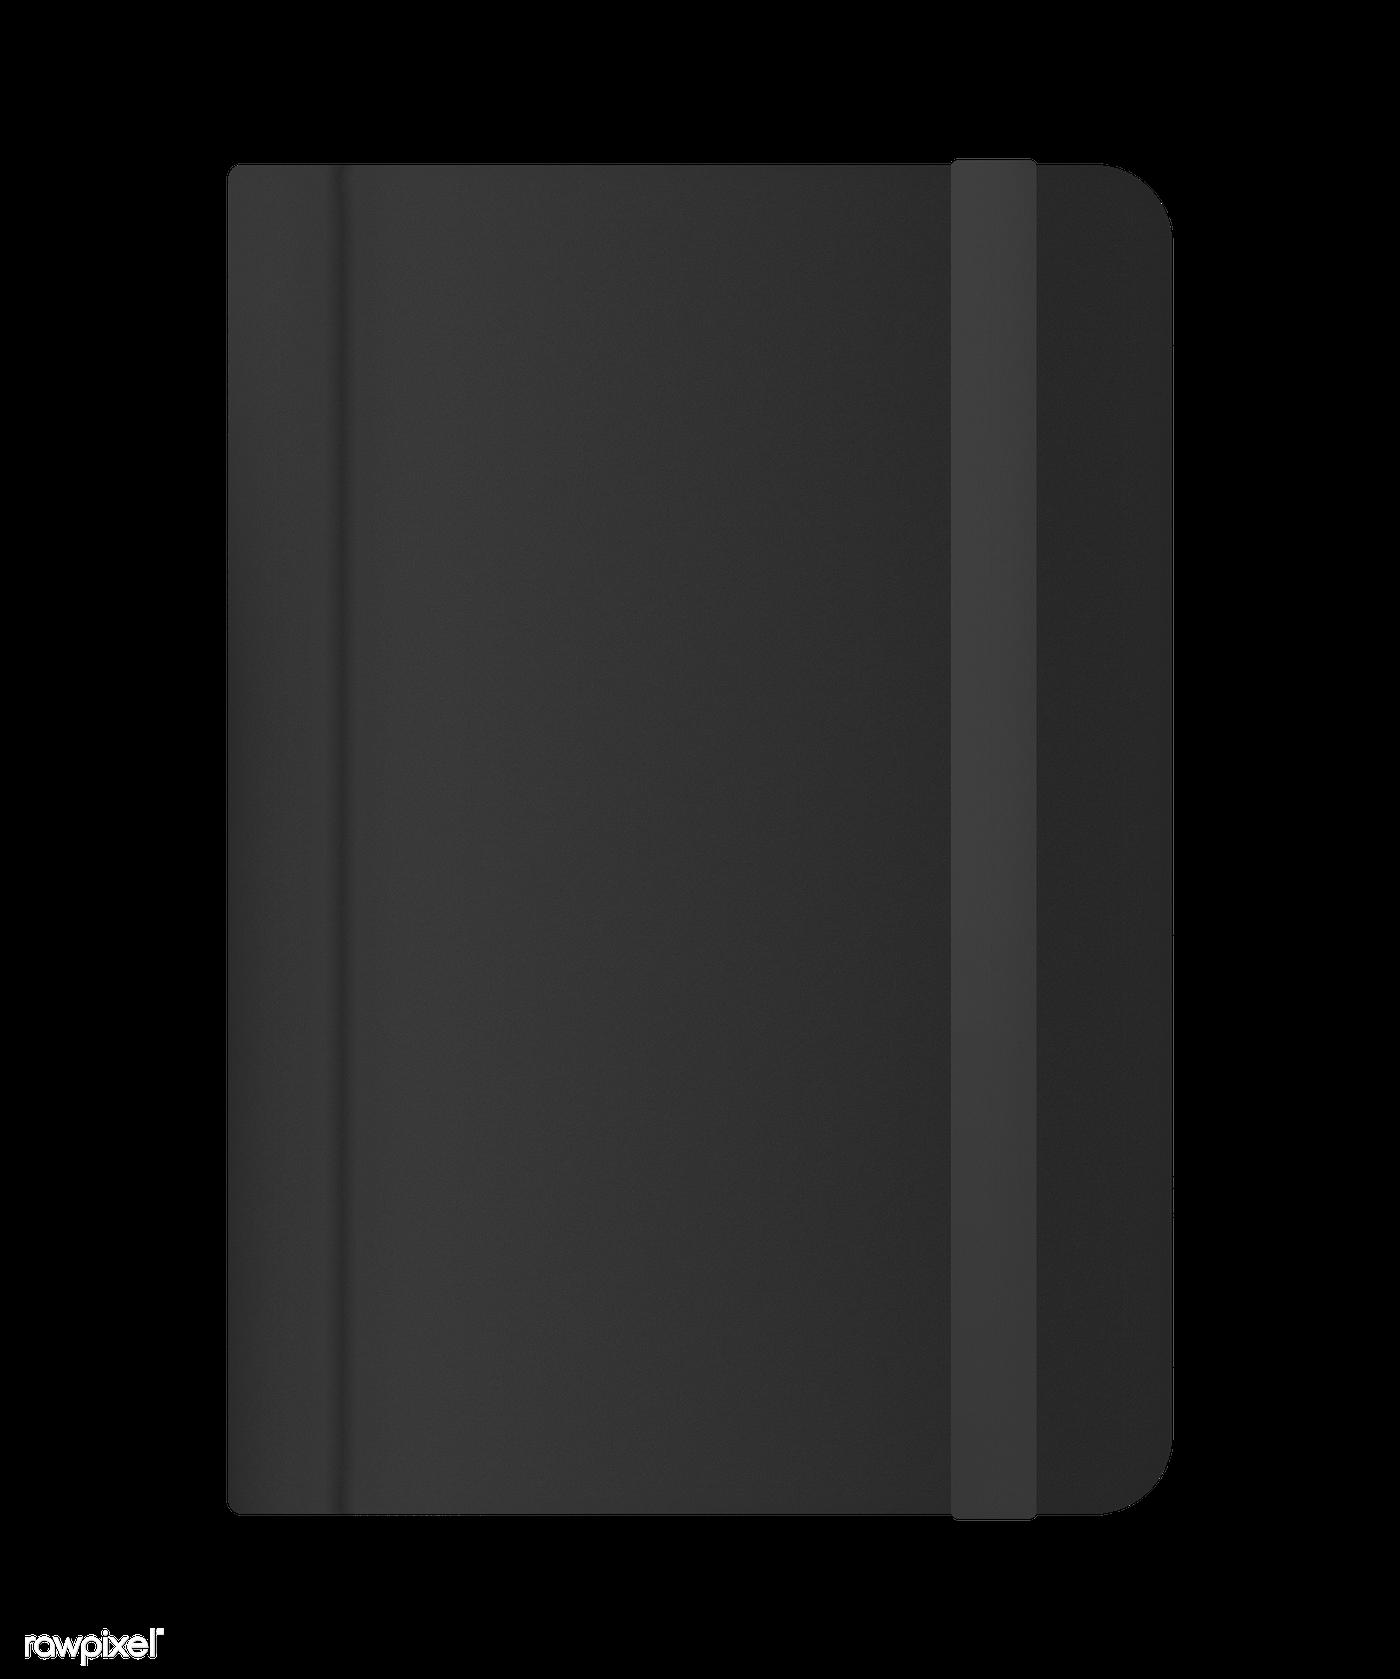 Download Premium Png Of Black Journal Cover Mockup Transparent Png 2026265